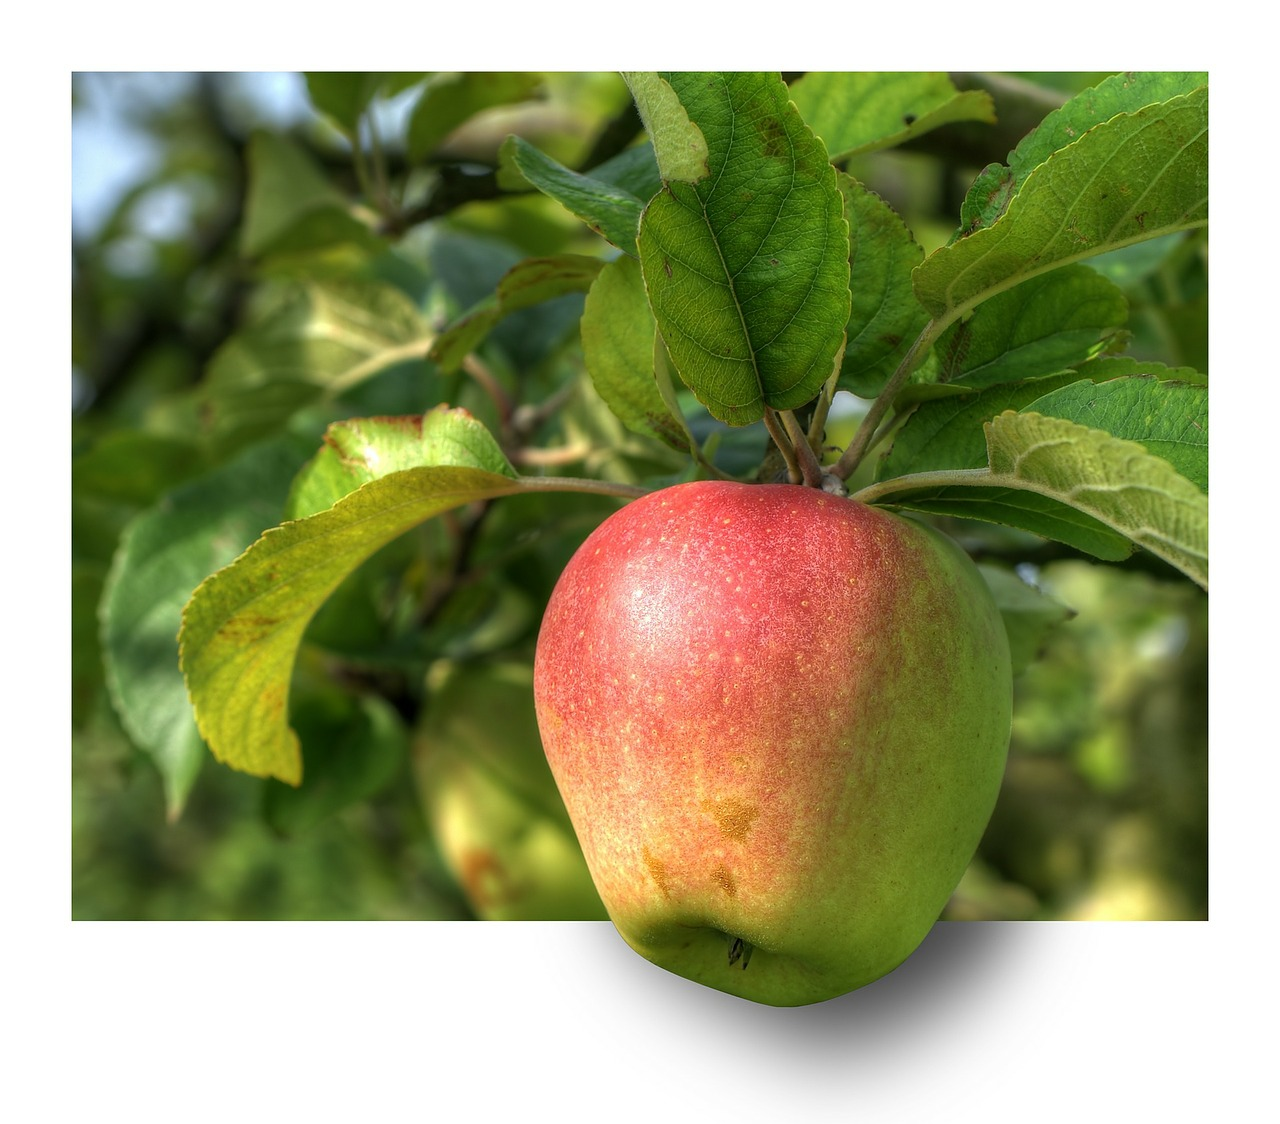 apple 191004 1280